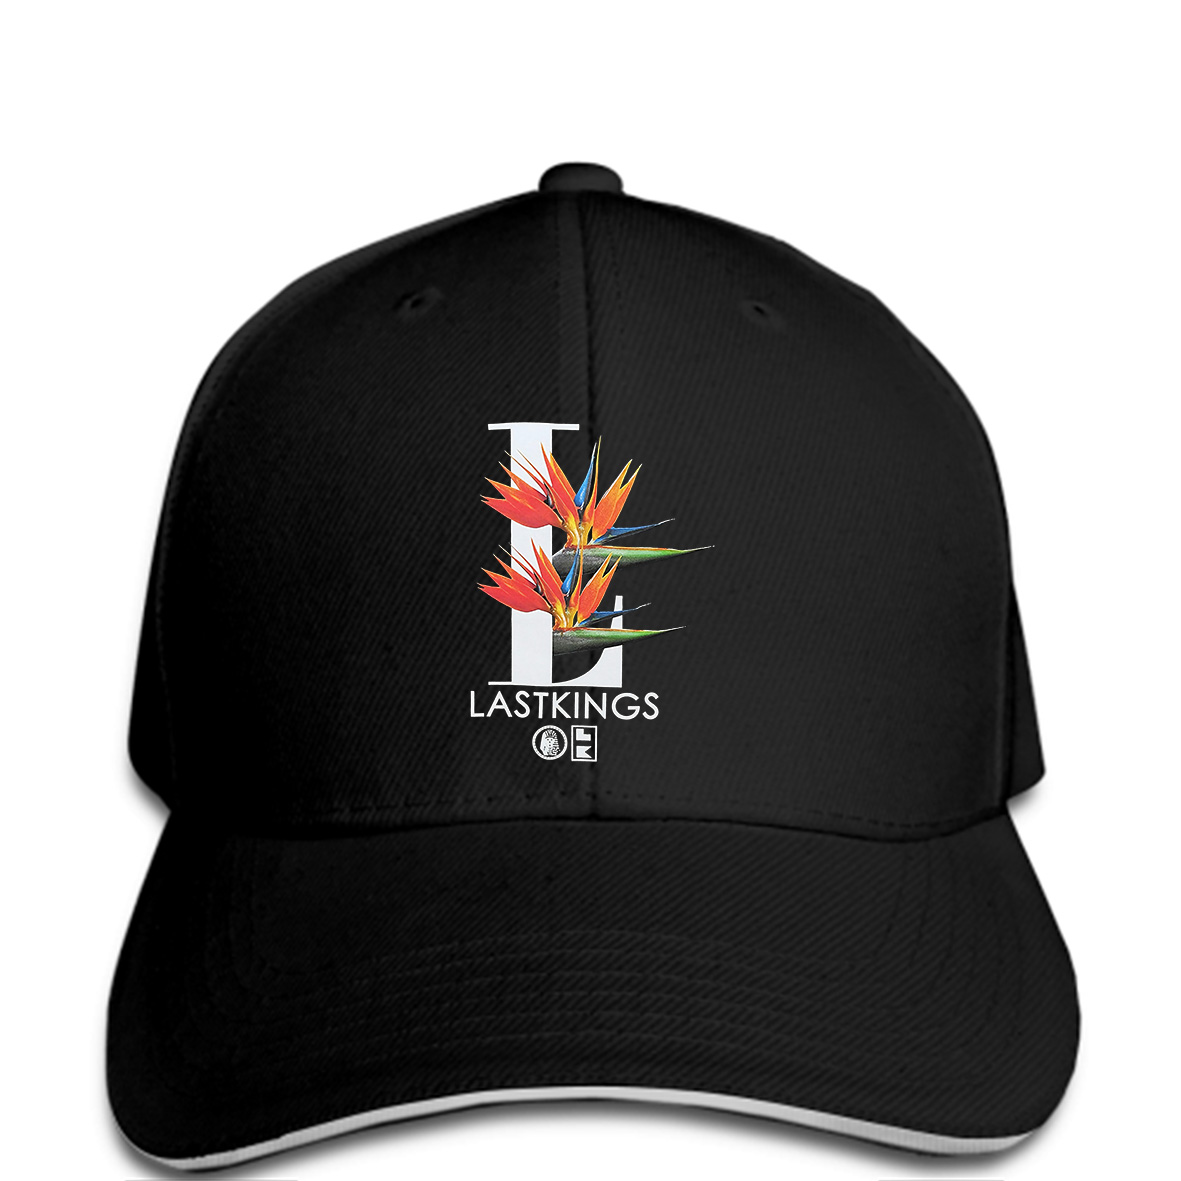 Men Baseball cap Last Kings Bird funny Hat novelty tsnapback women ... 062944cbffd9